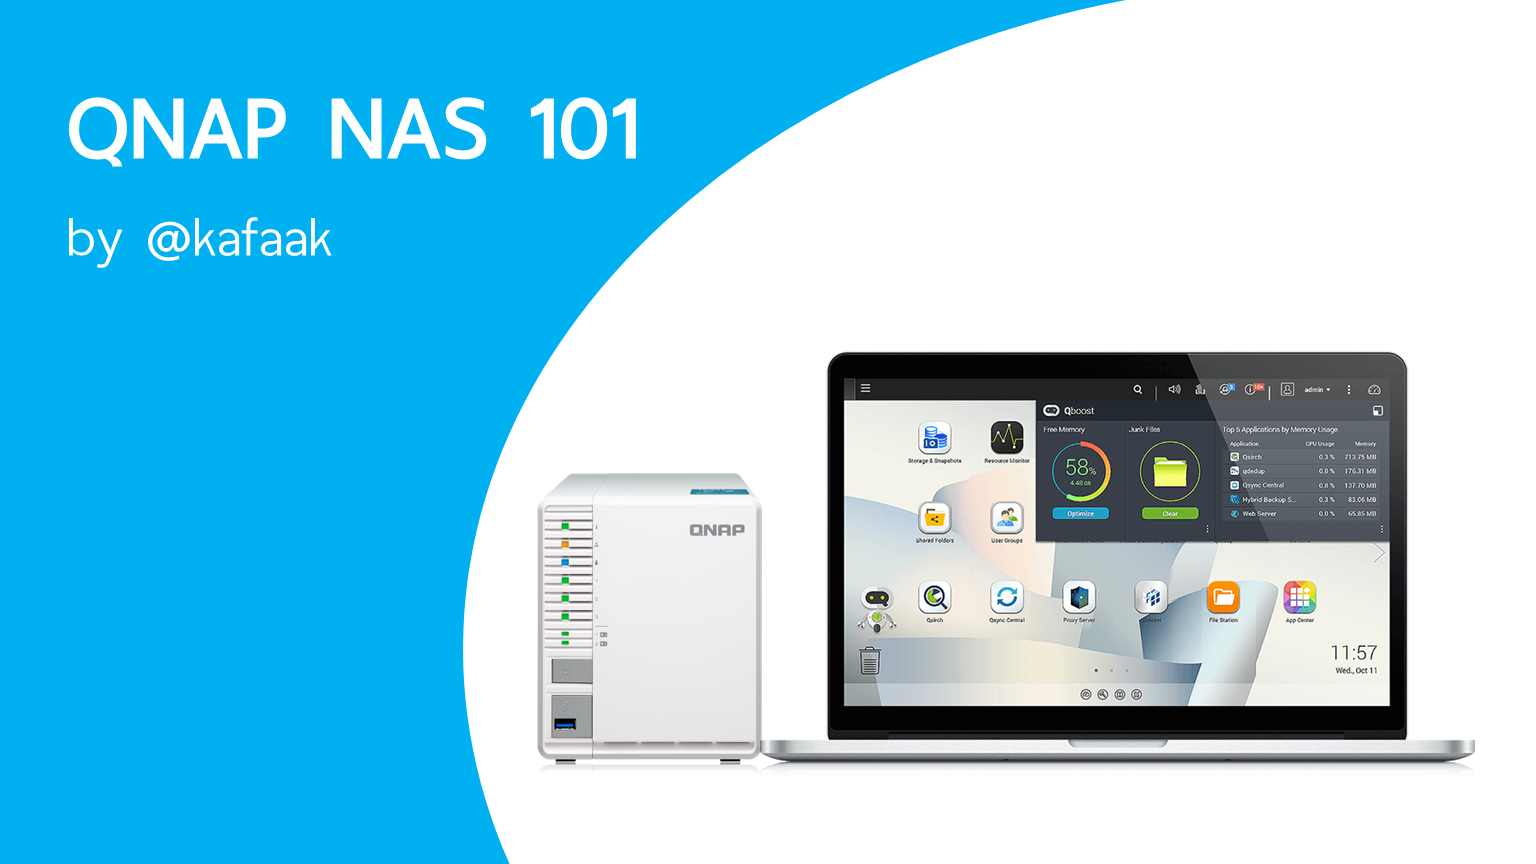 QNAP NAS 101 - EP 6: รู้จักกับ Shared folders และ User home folder 1